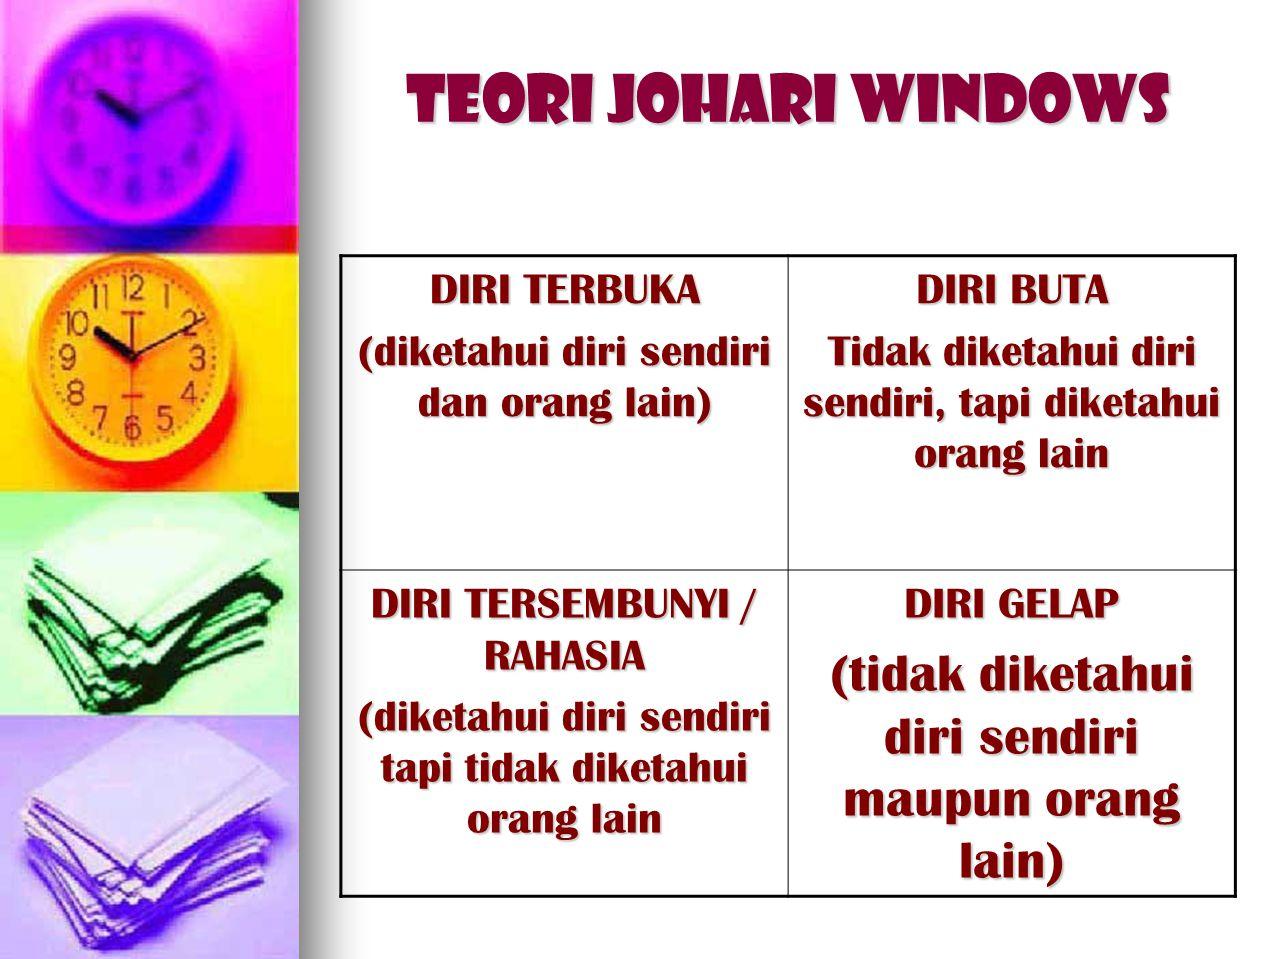 Teori JOHARI WINDOWS (tidak diketahui diri sendiri maupun orang lain)